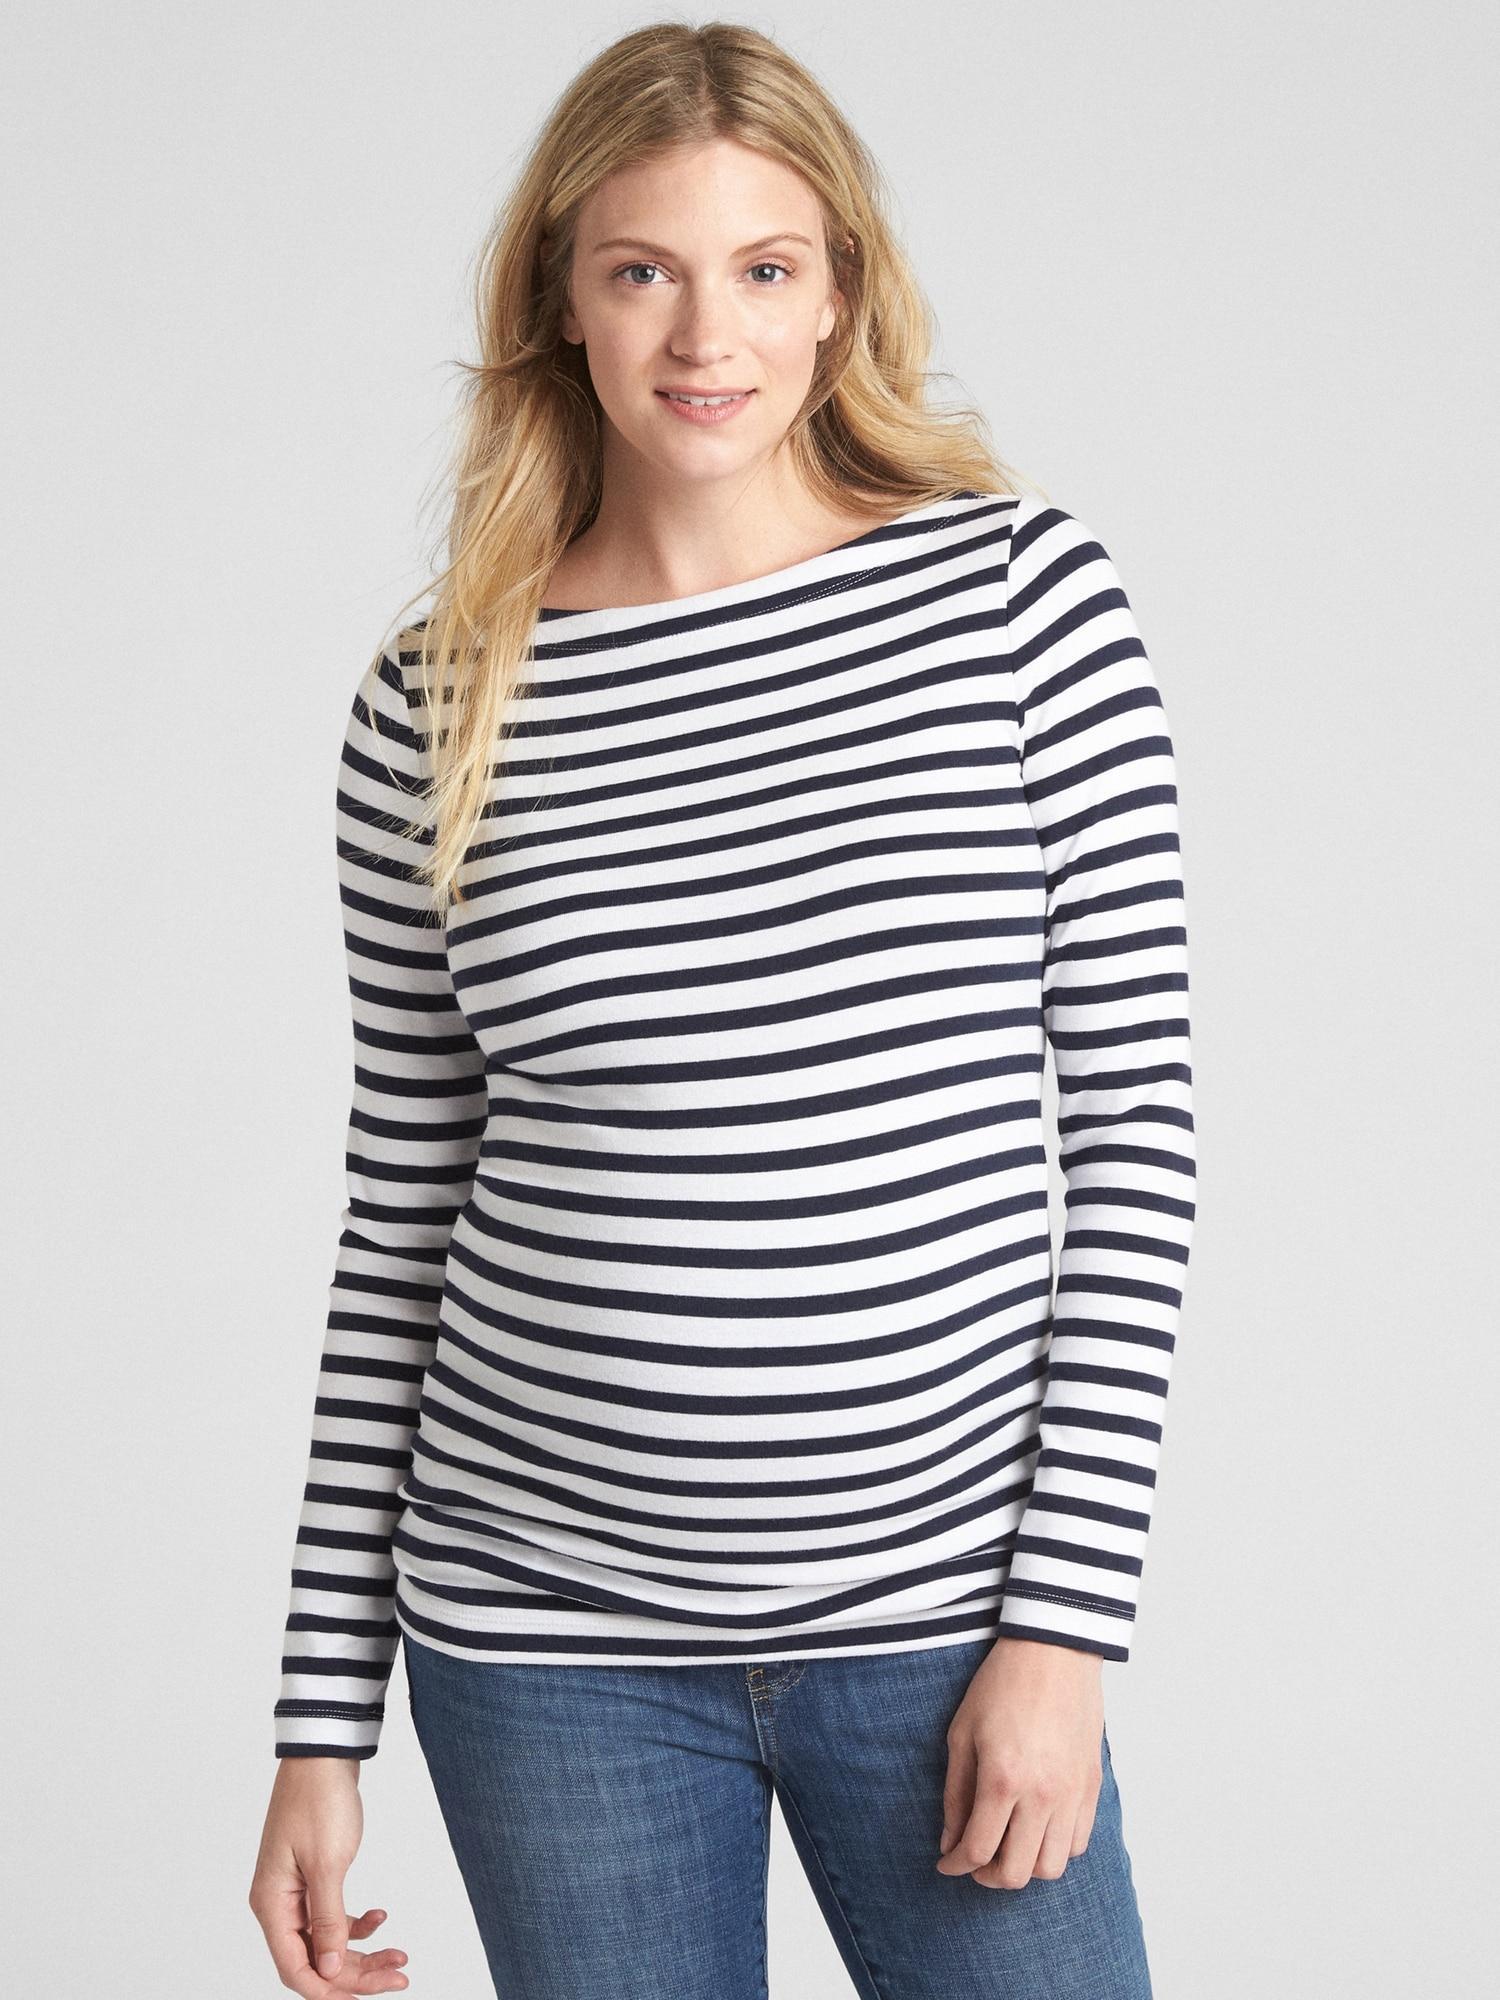 266ee29b531f6 Lyst - Gap Maternity Modern Stripe Boatneck T-shirt in Blue